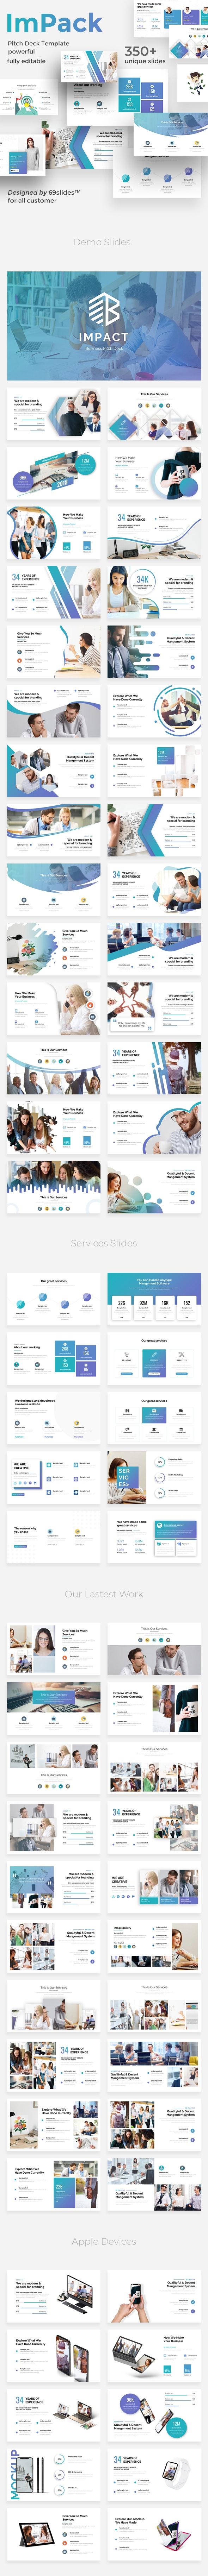 Business Impact Pitch Deck Google Slide Template - Google Slides Presentation Templates